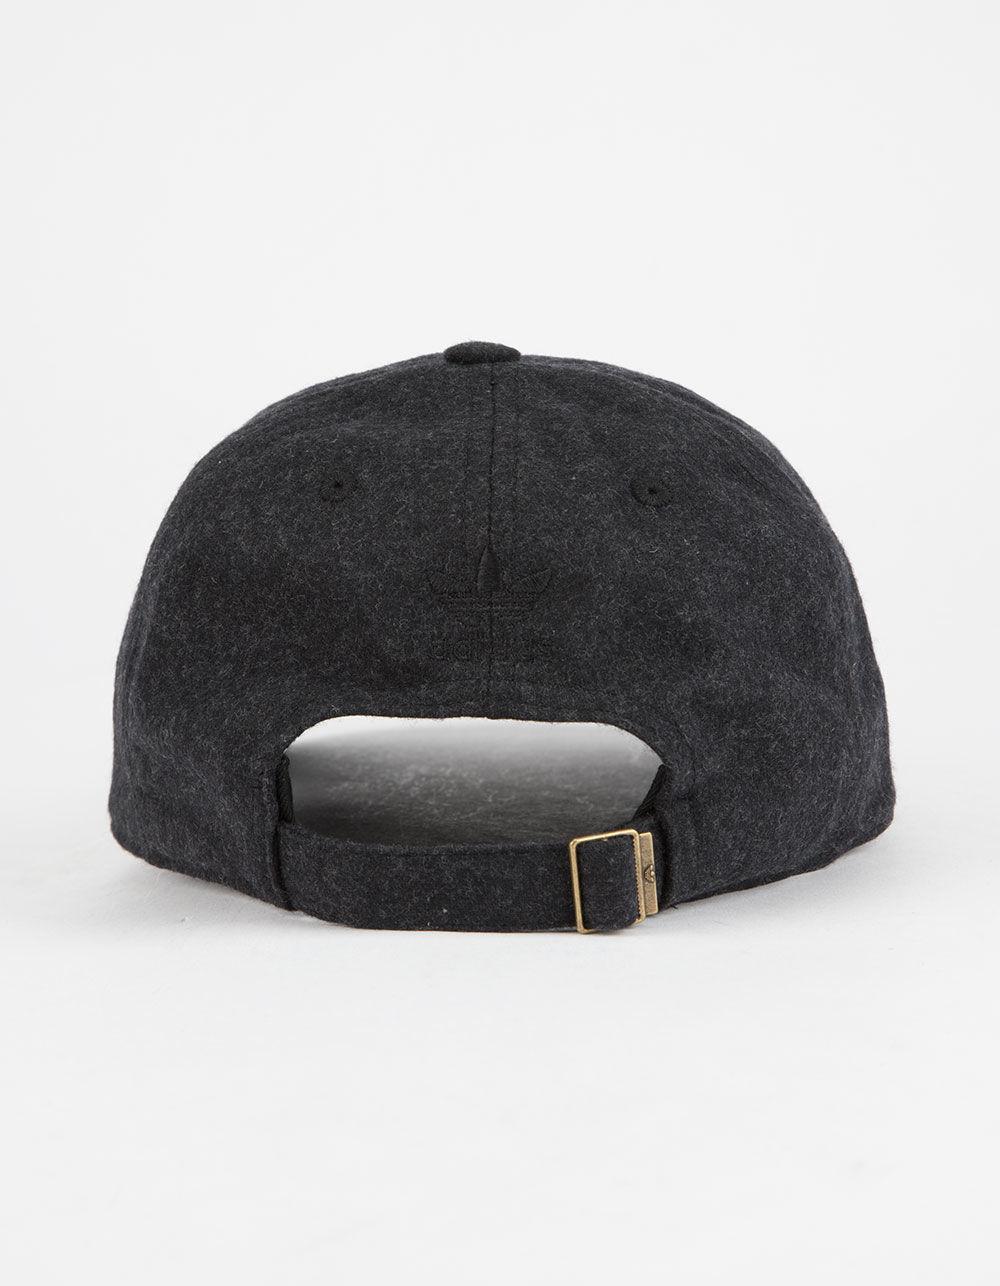 size 40 dae4d 7bb22 View Fullscreen Adidas Originals Black Originals Relaxed Plus Mens  Strapback Hat for Men Lyst. View Fullscreen adidas Originals Womens ...